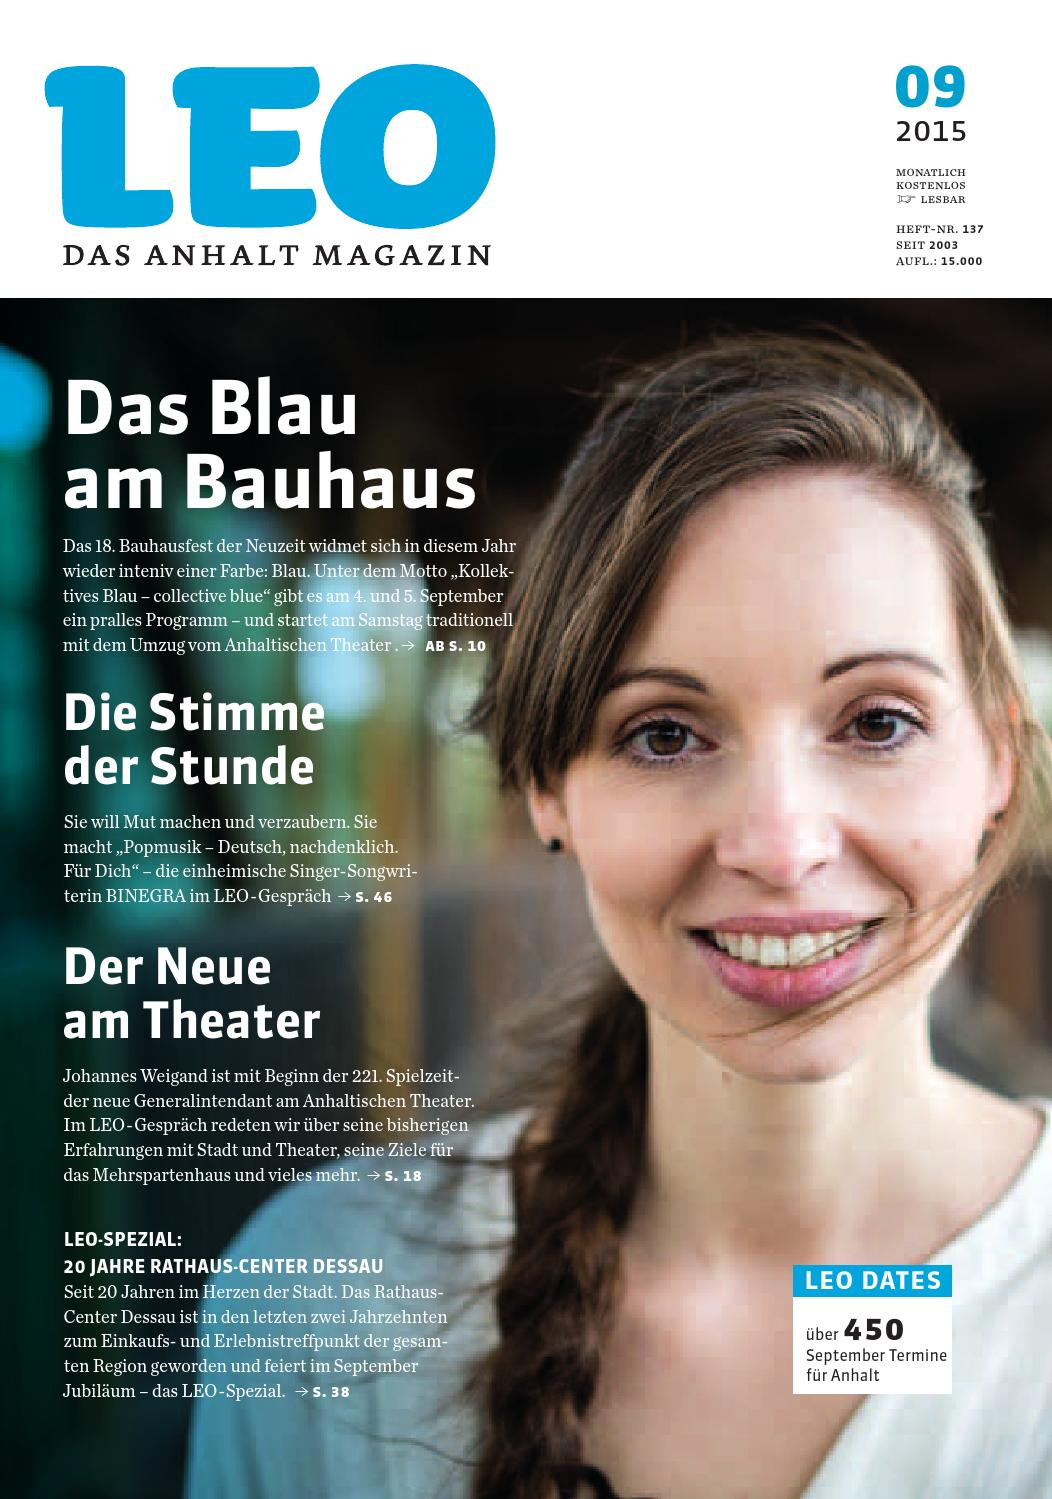 LEO September 2015 by LEO – Das Anhalt Magazin - issuu